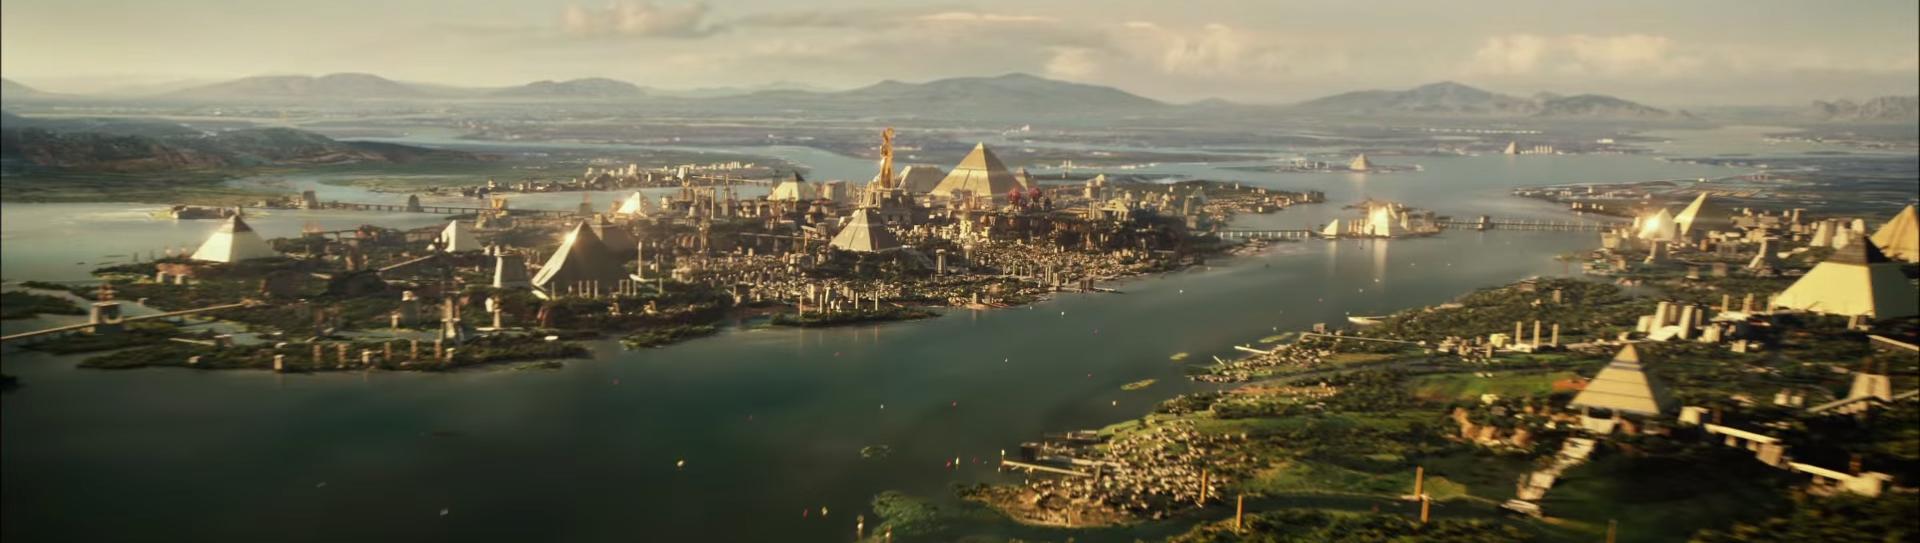 Gods of Egypt. Image Credit: Lionsgate.